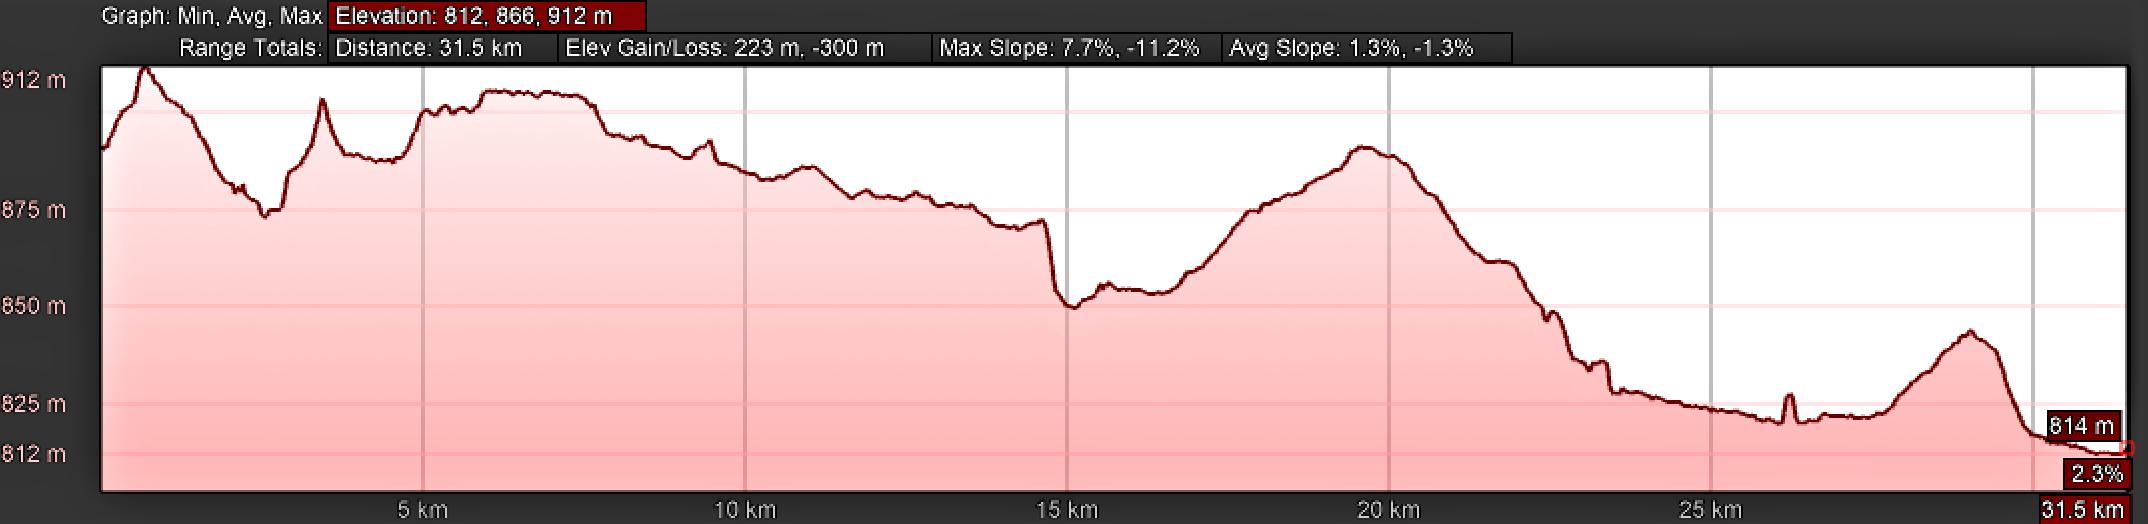 Elevation Profile, Day Five, Camino Teresiano Northern Route, Mancera de Abajo to Garcihernández